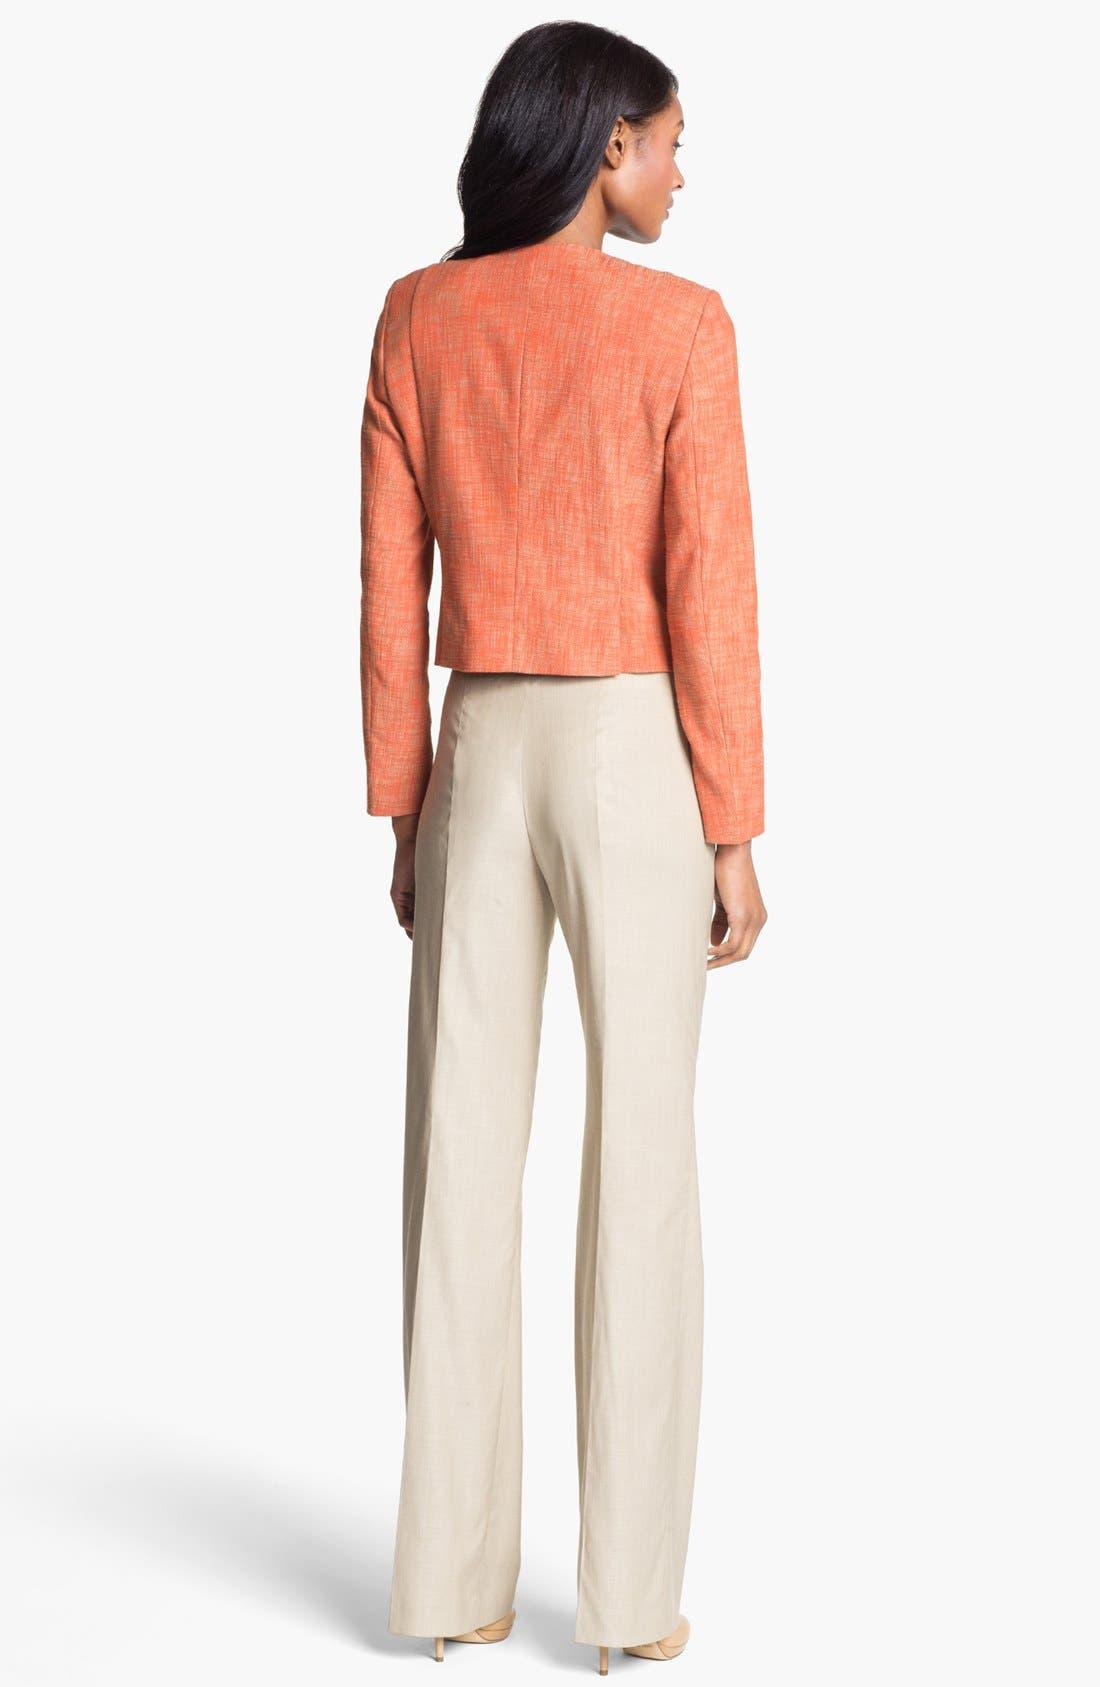 HUGO BOSS 'Tilana' Trousers,                             Alternate thumbnail 3, color,                             294